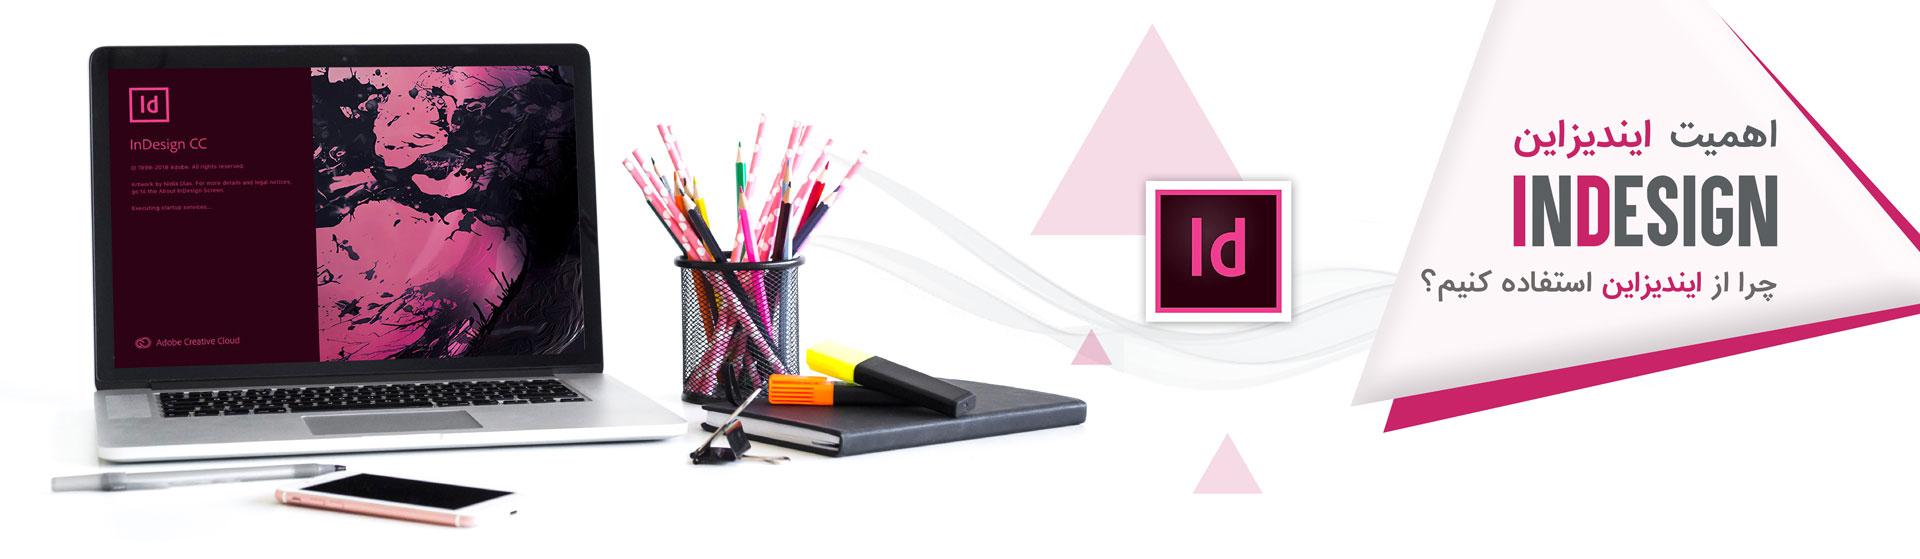 Why use Adobe InDesign 1 - اهمیت ایندیزاین